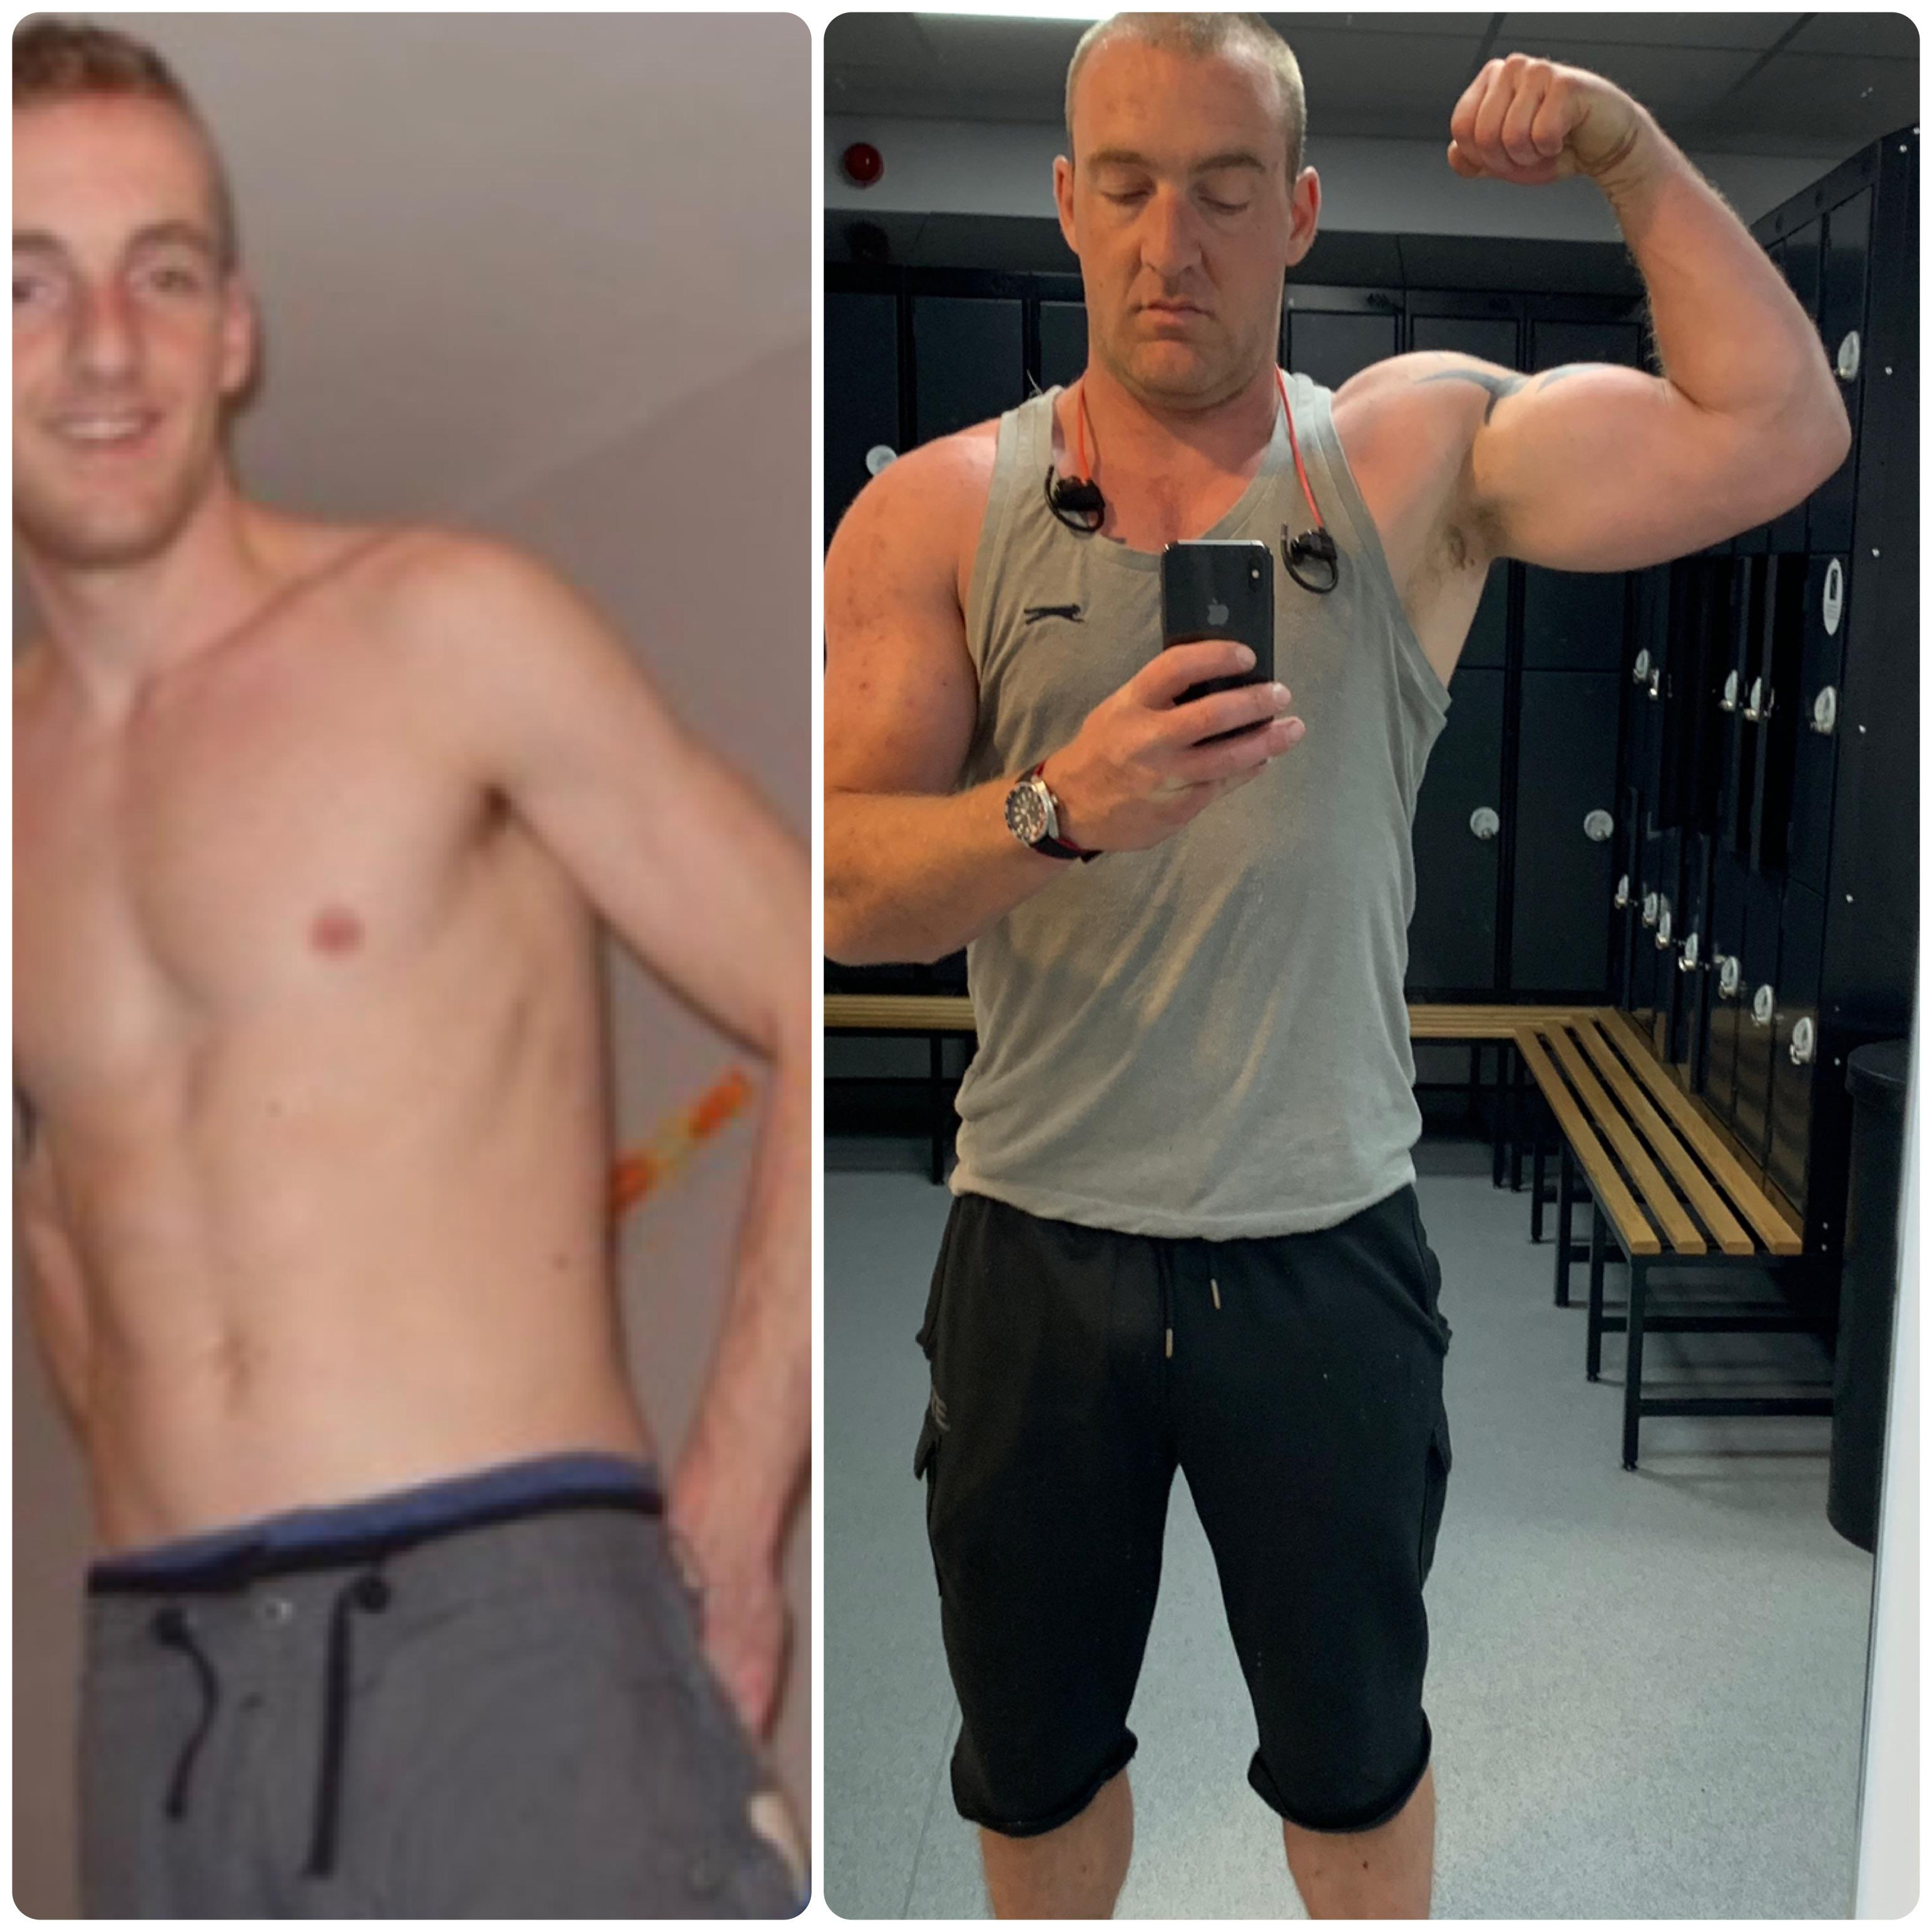 48 lbs Muscle Gain 6 foot 4 Male 176 lbs to 224 lbs